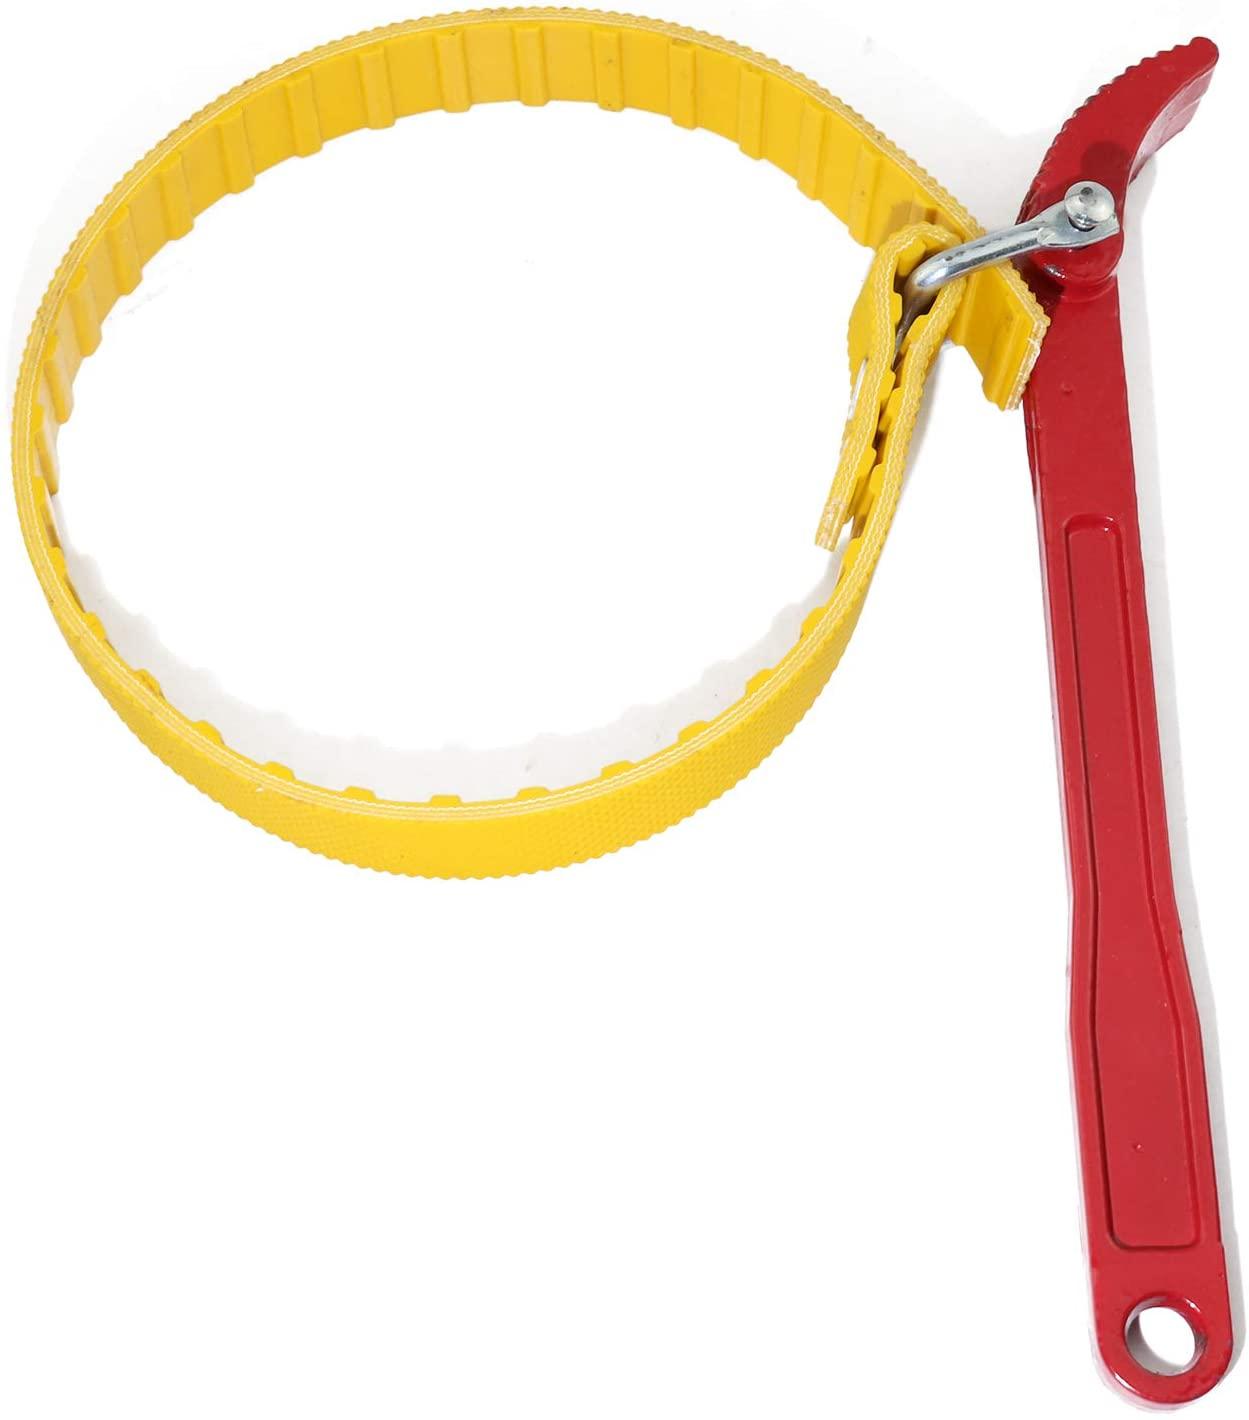 Boeray Multi-Purpose Belt Strap Wrench, 23